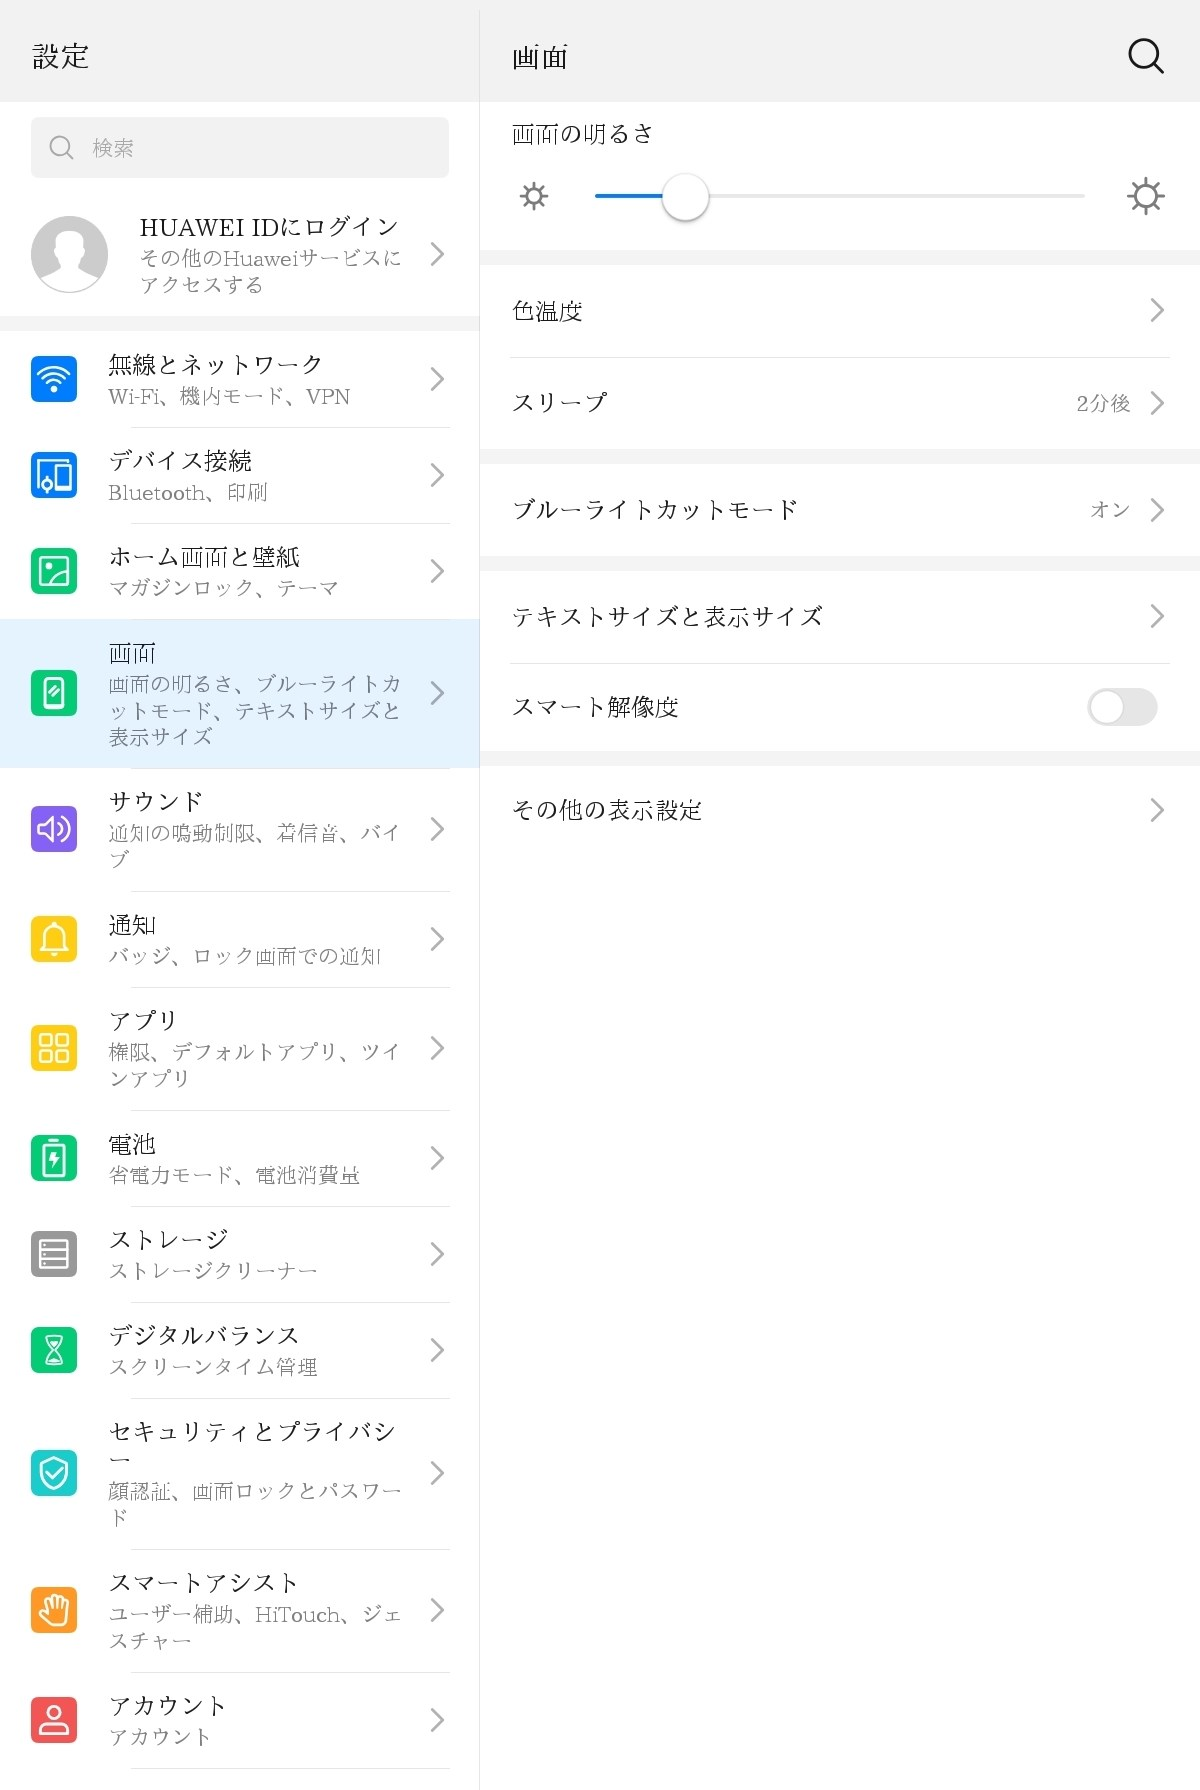 MediaPad M5 lite 8_設定_明朝体フォント